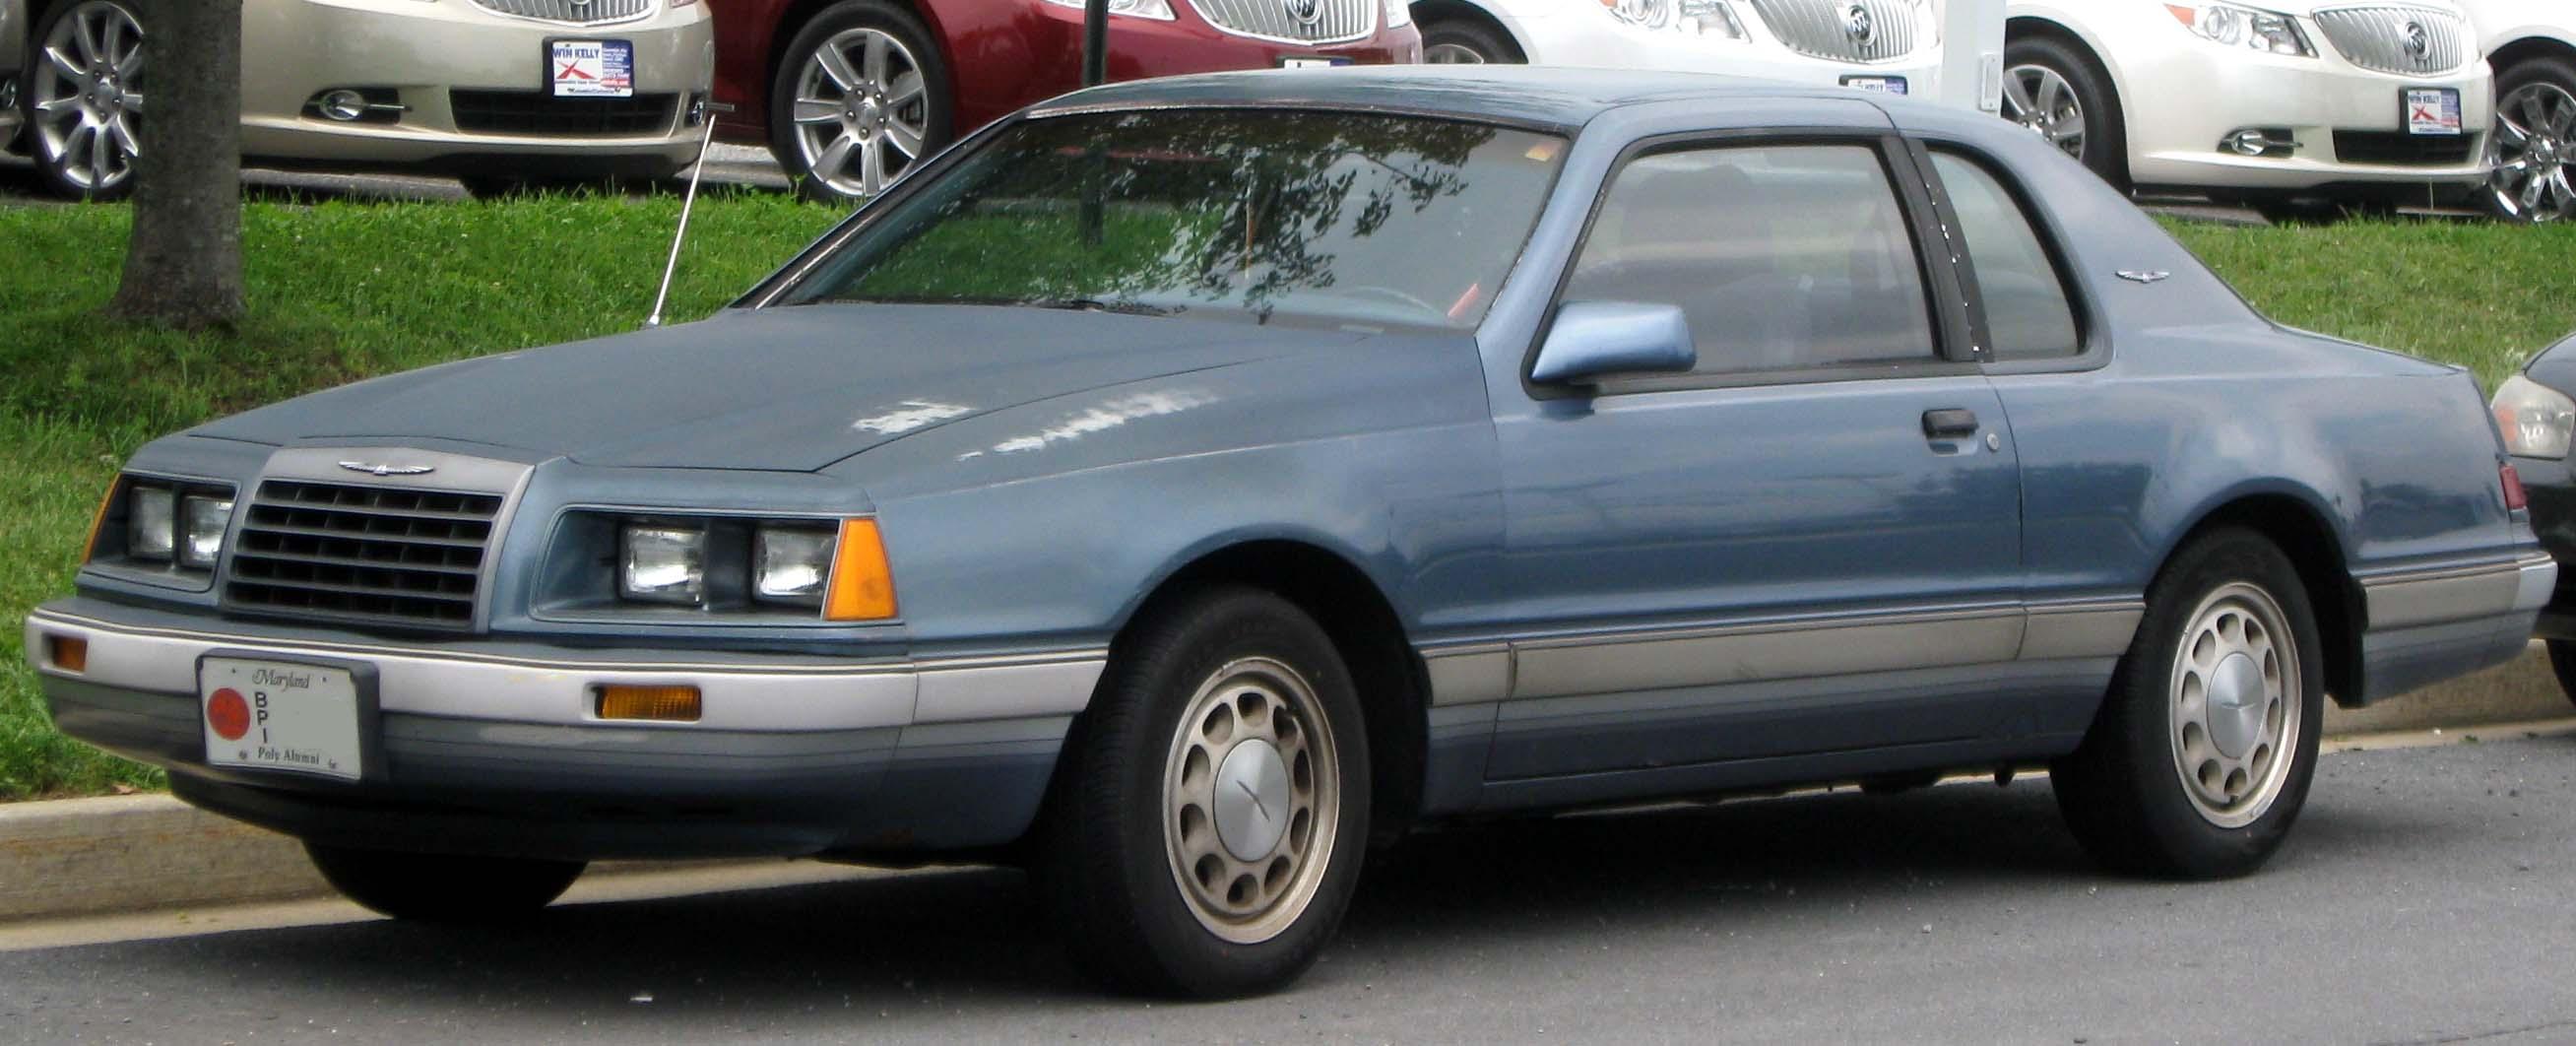 Ford thunderbird ninth generation wikipedia